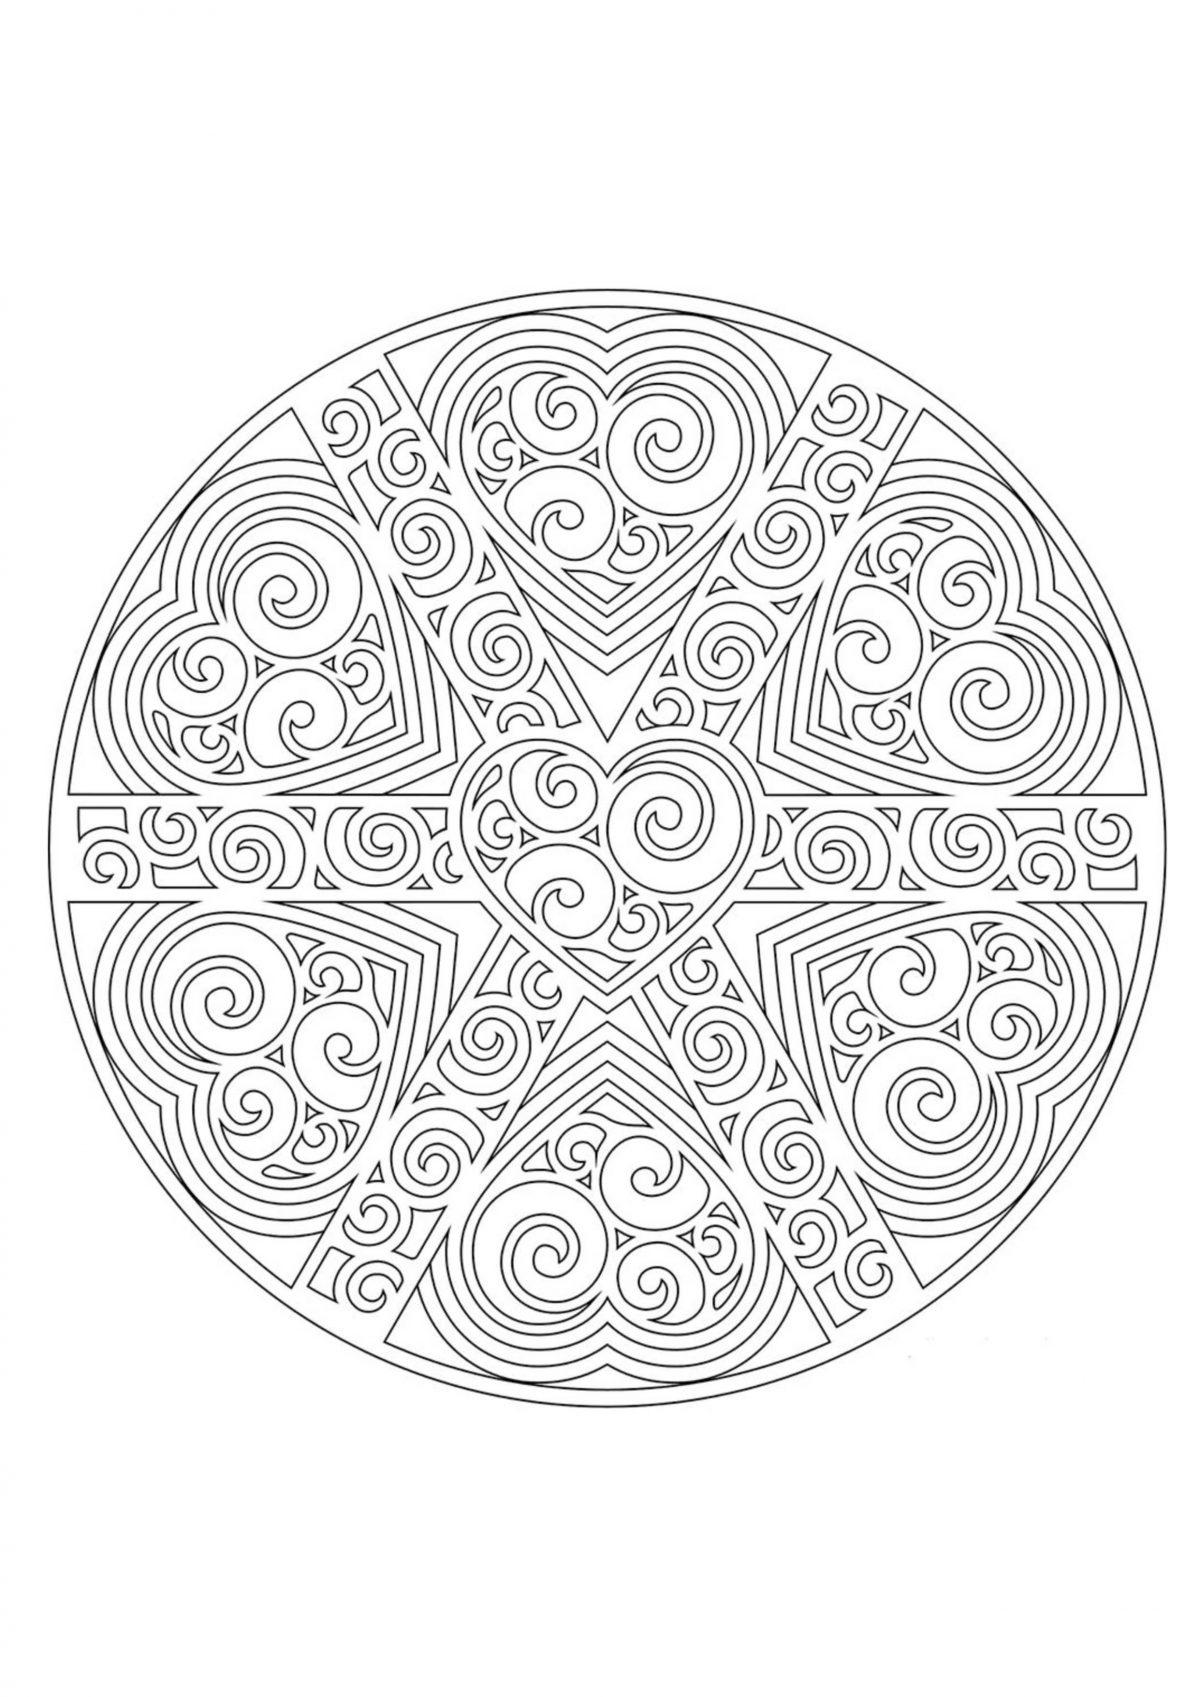 Раскраска узор в круге - Раскраски А4 формата для распечатки